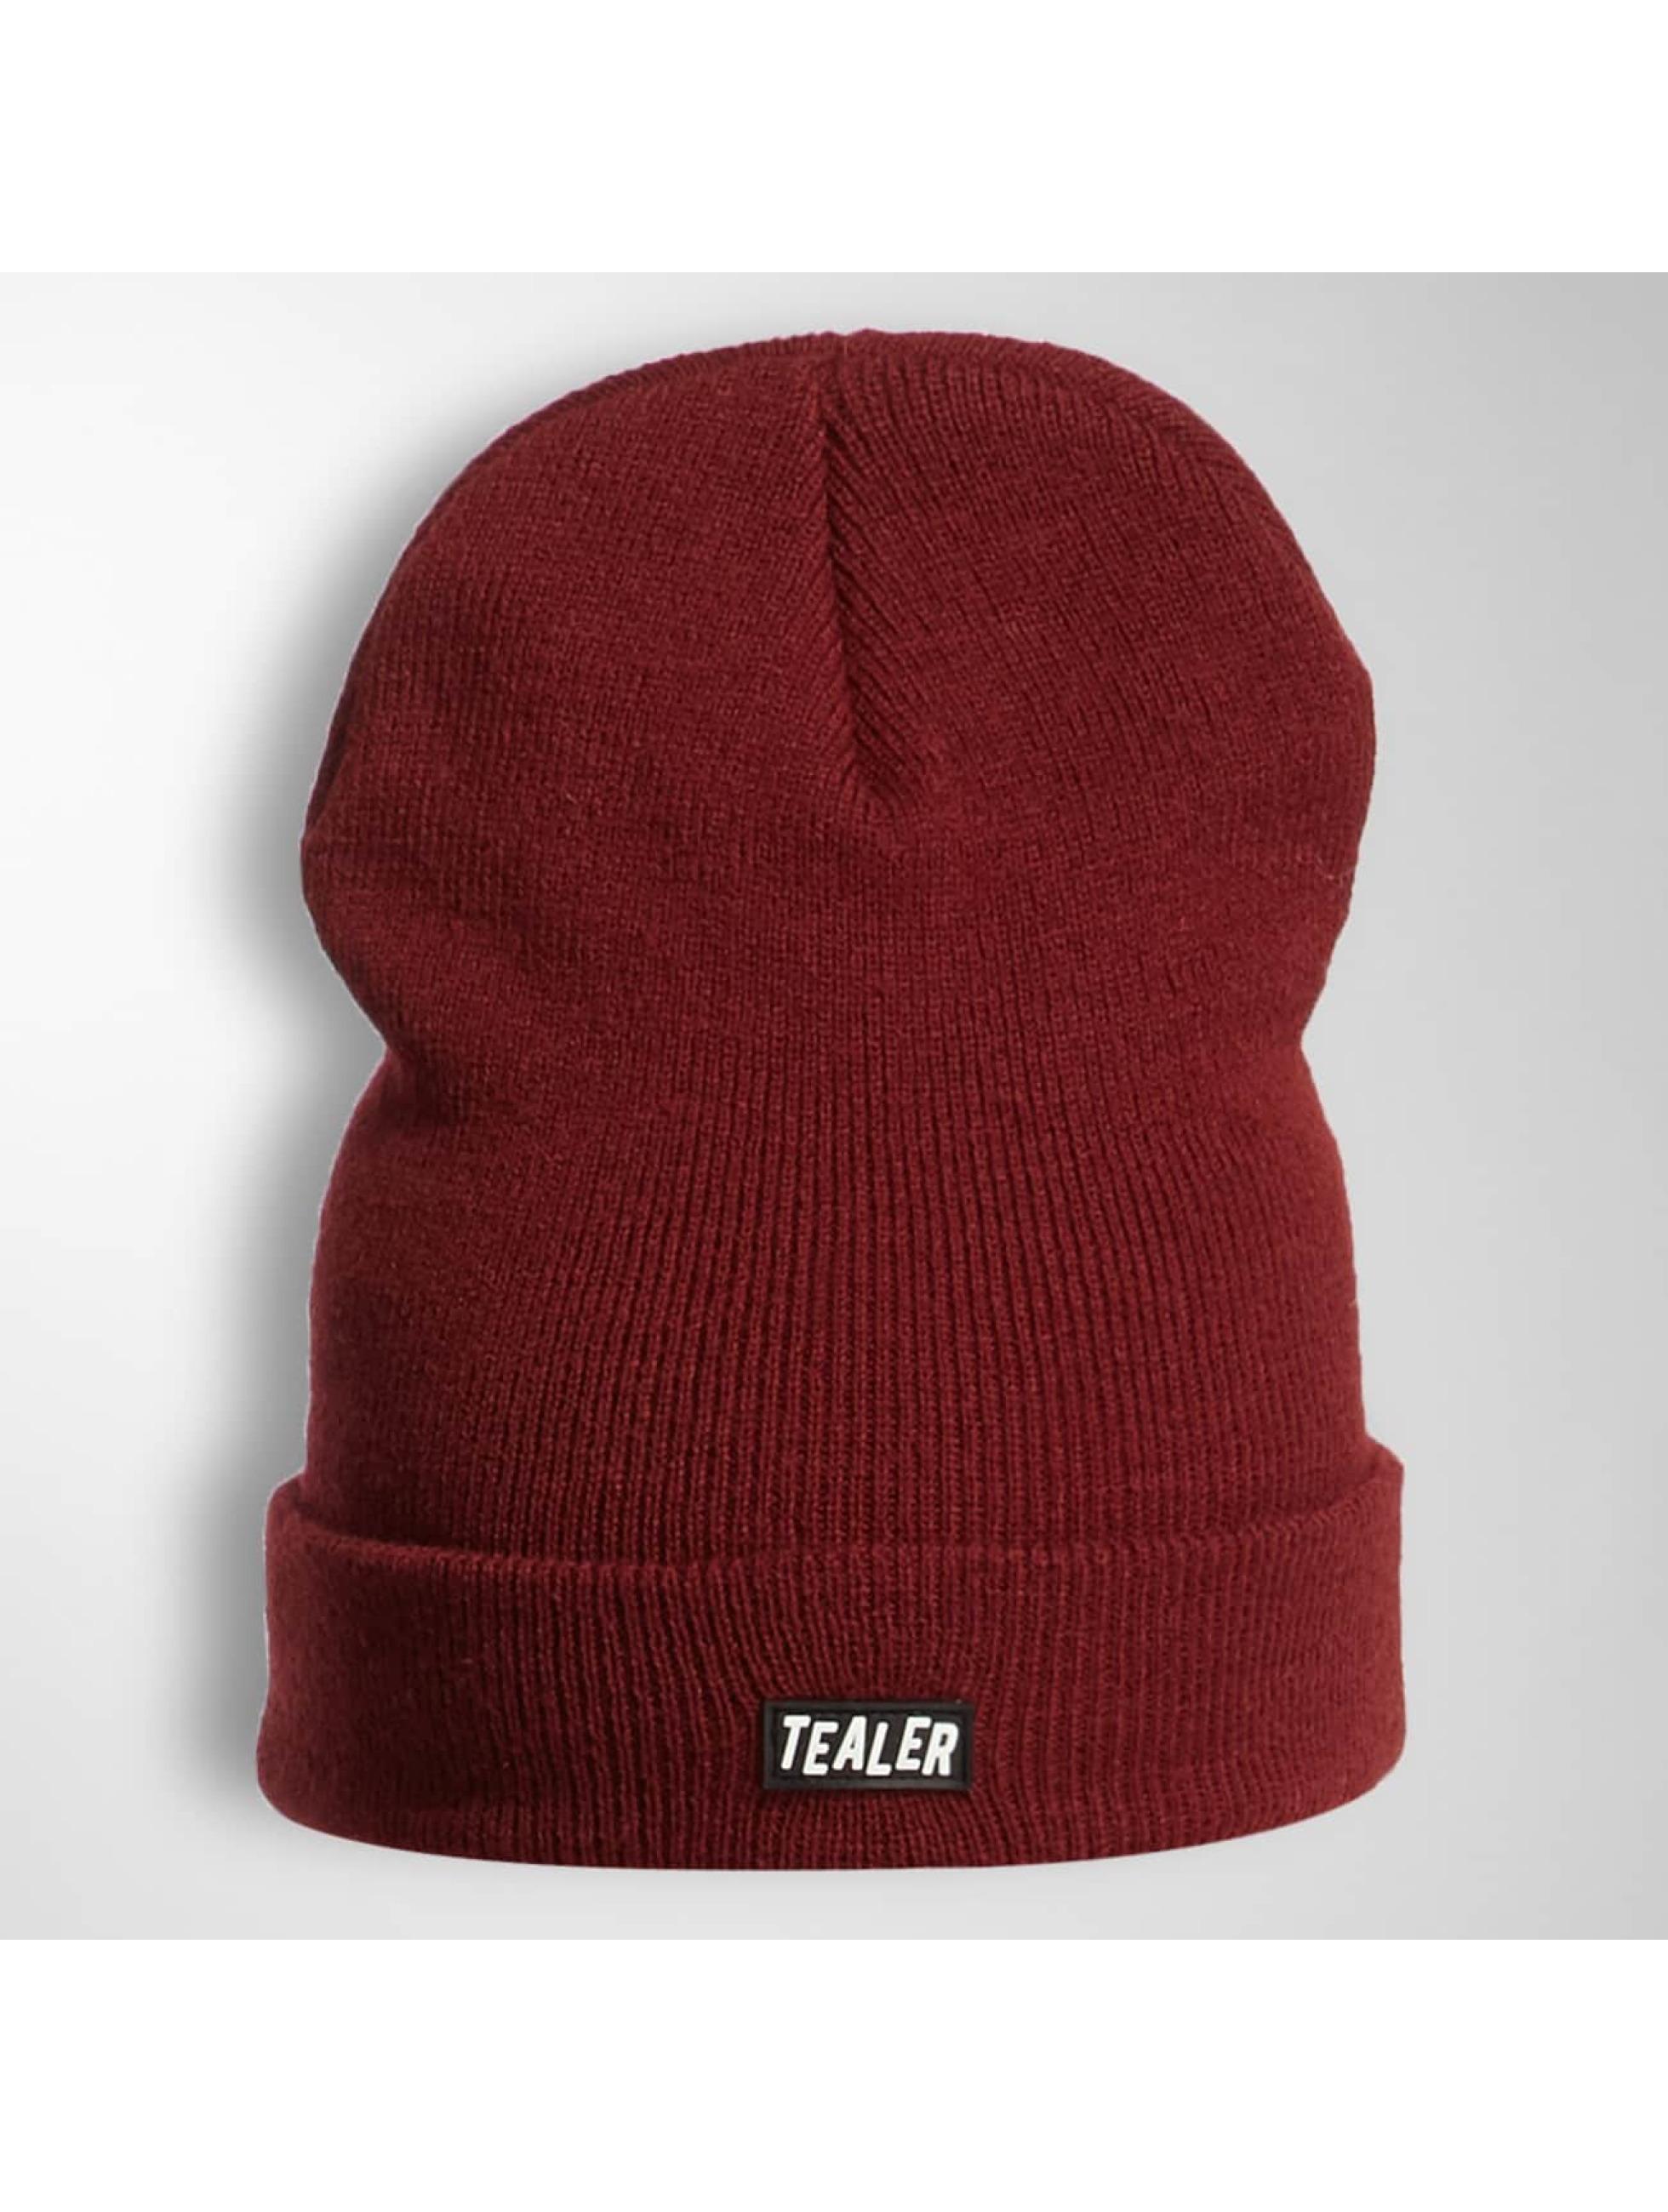 Tealer Hat-1 PVC Patch red